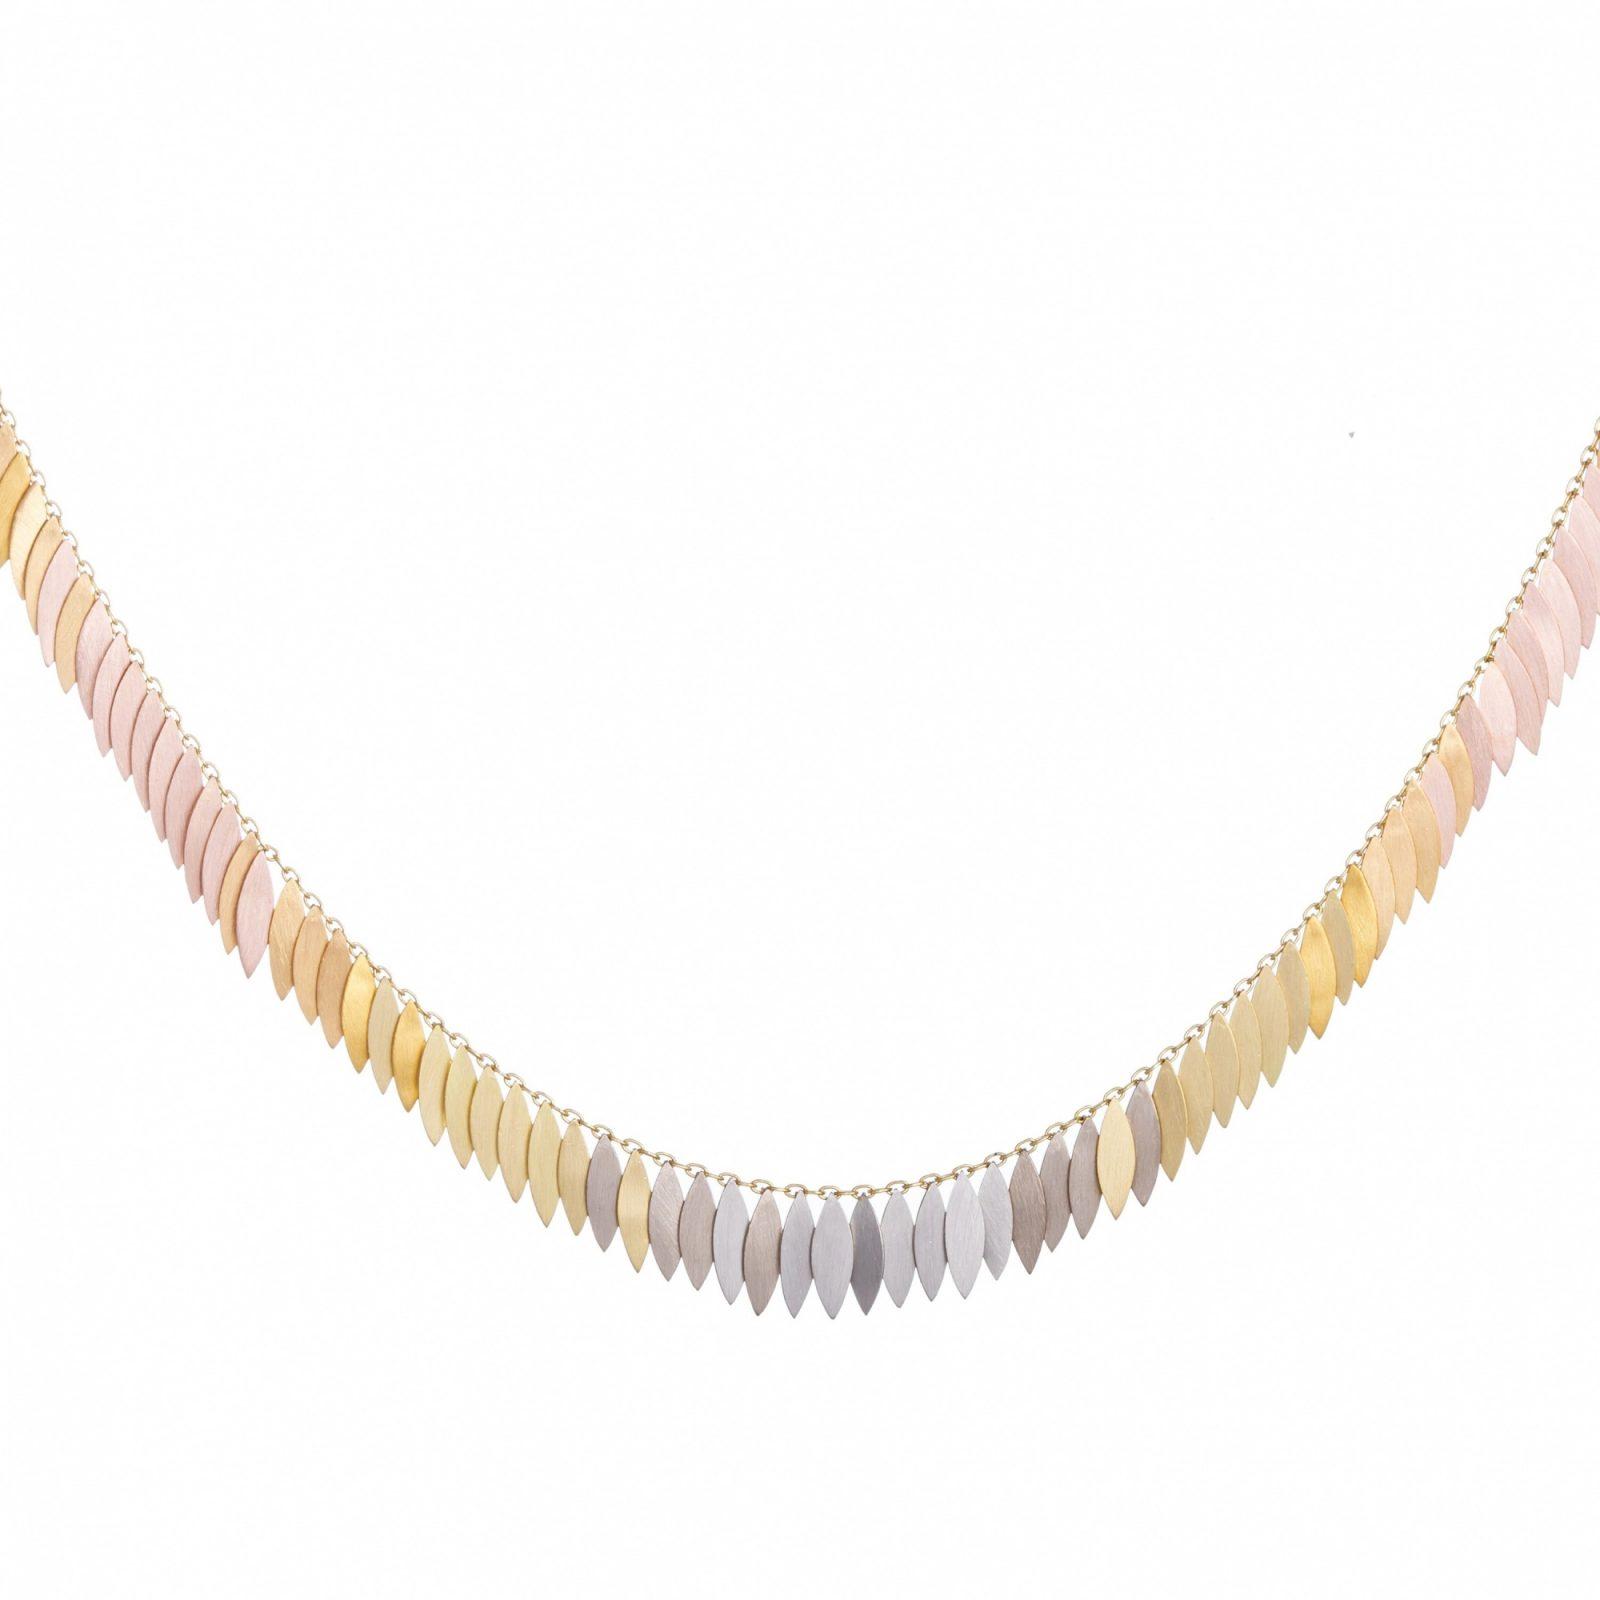 Sia Taylor KN26 RAIN Rainbow Gold Leaf Full Necklace WB